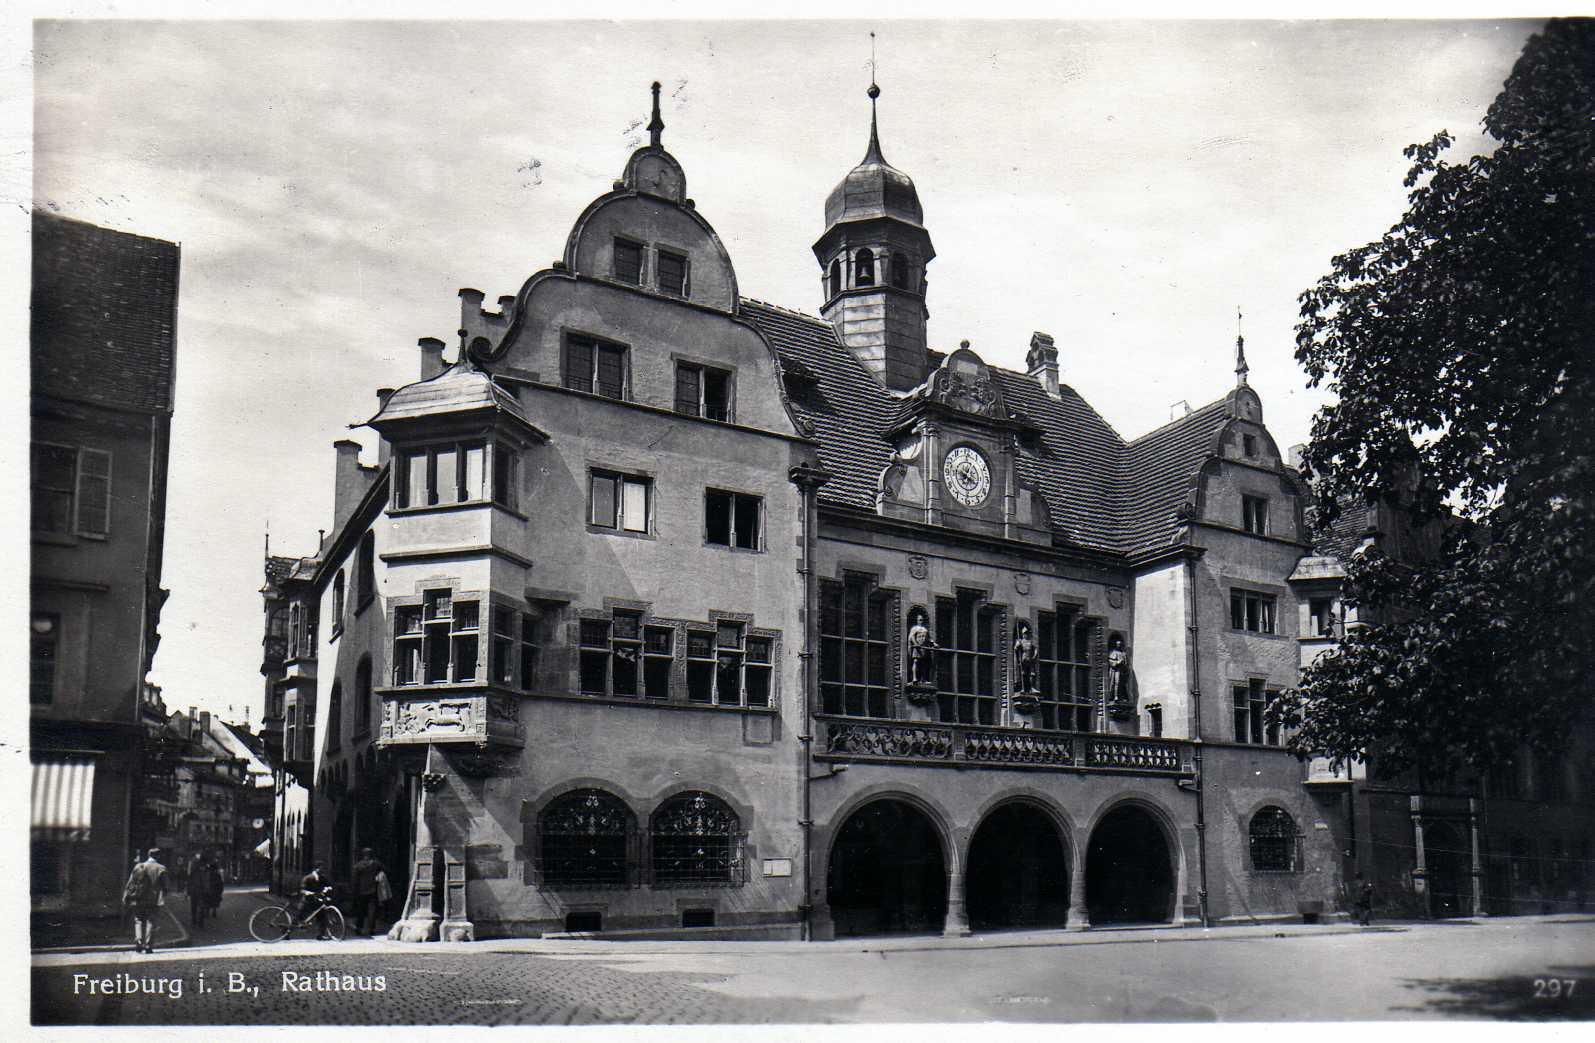 Rathaus_Freiburg_1930er